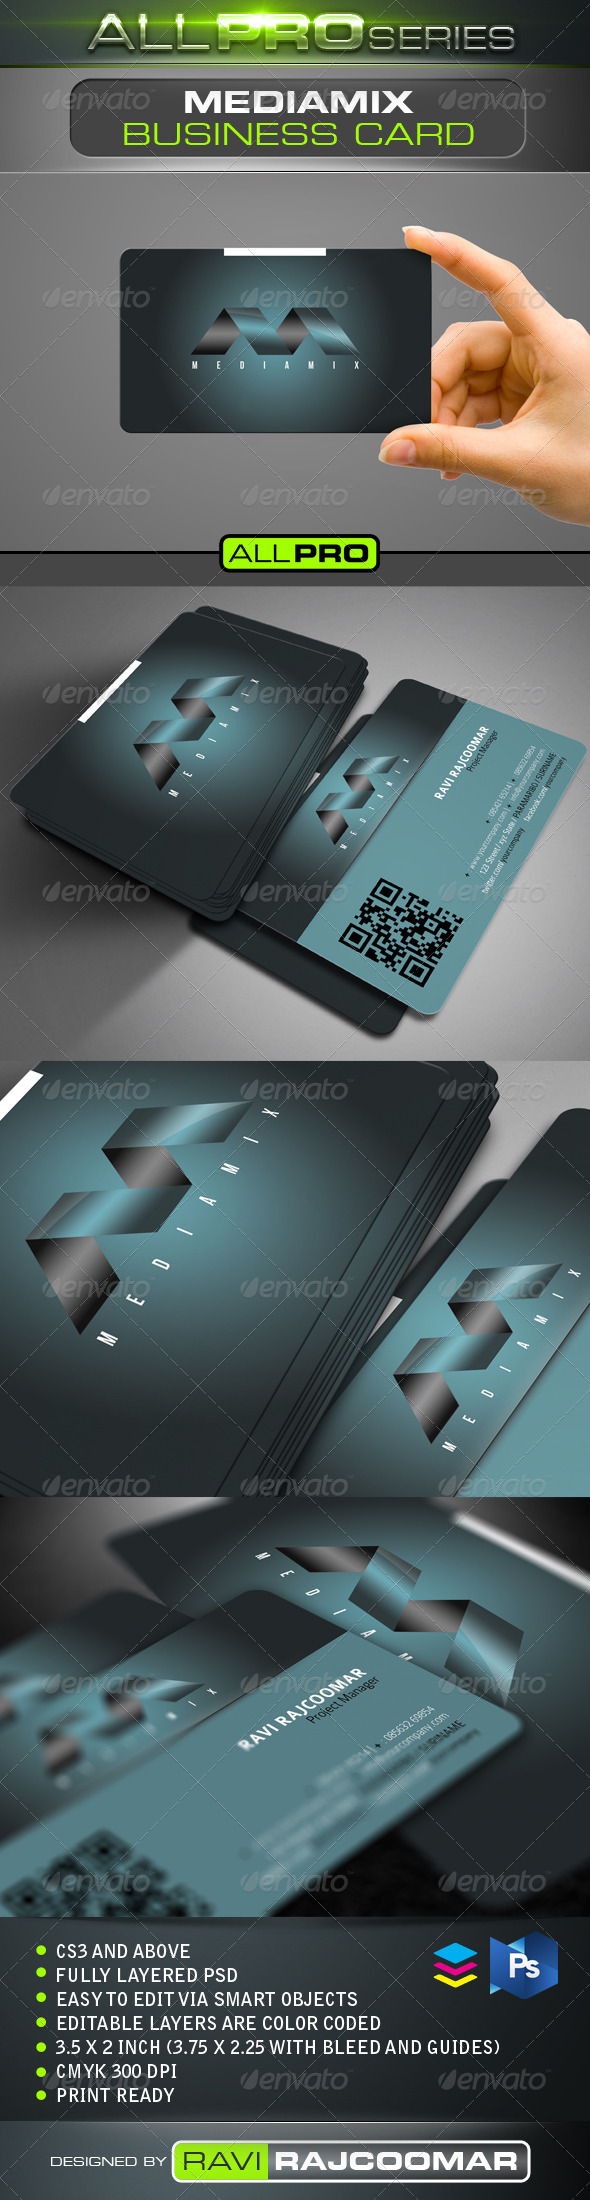 Mediamix Business Card Template - Corporate Business Cards